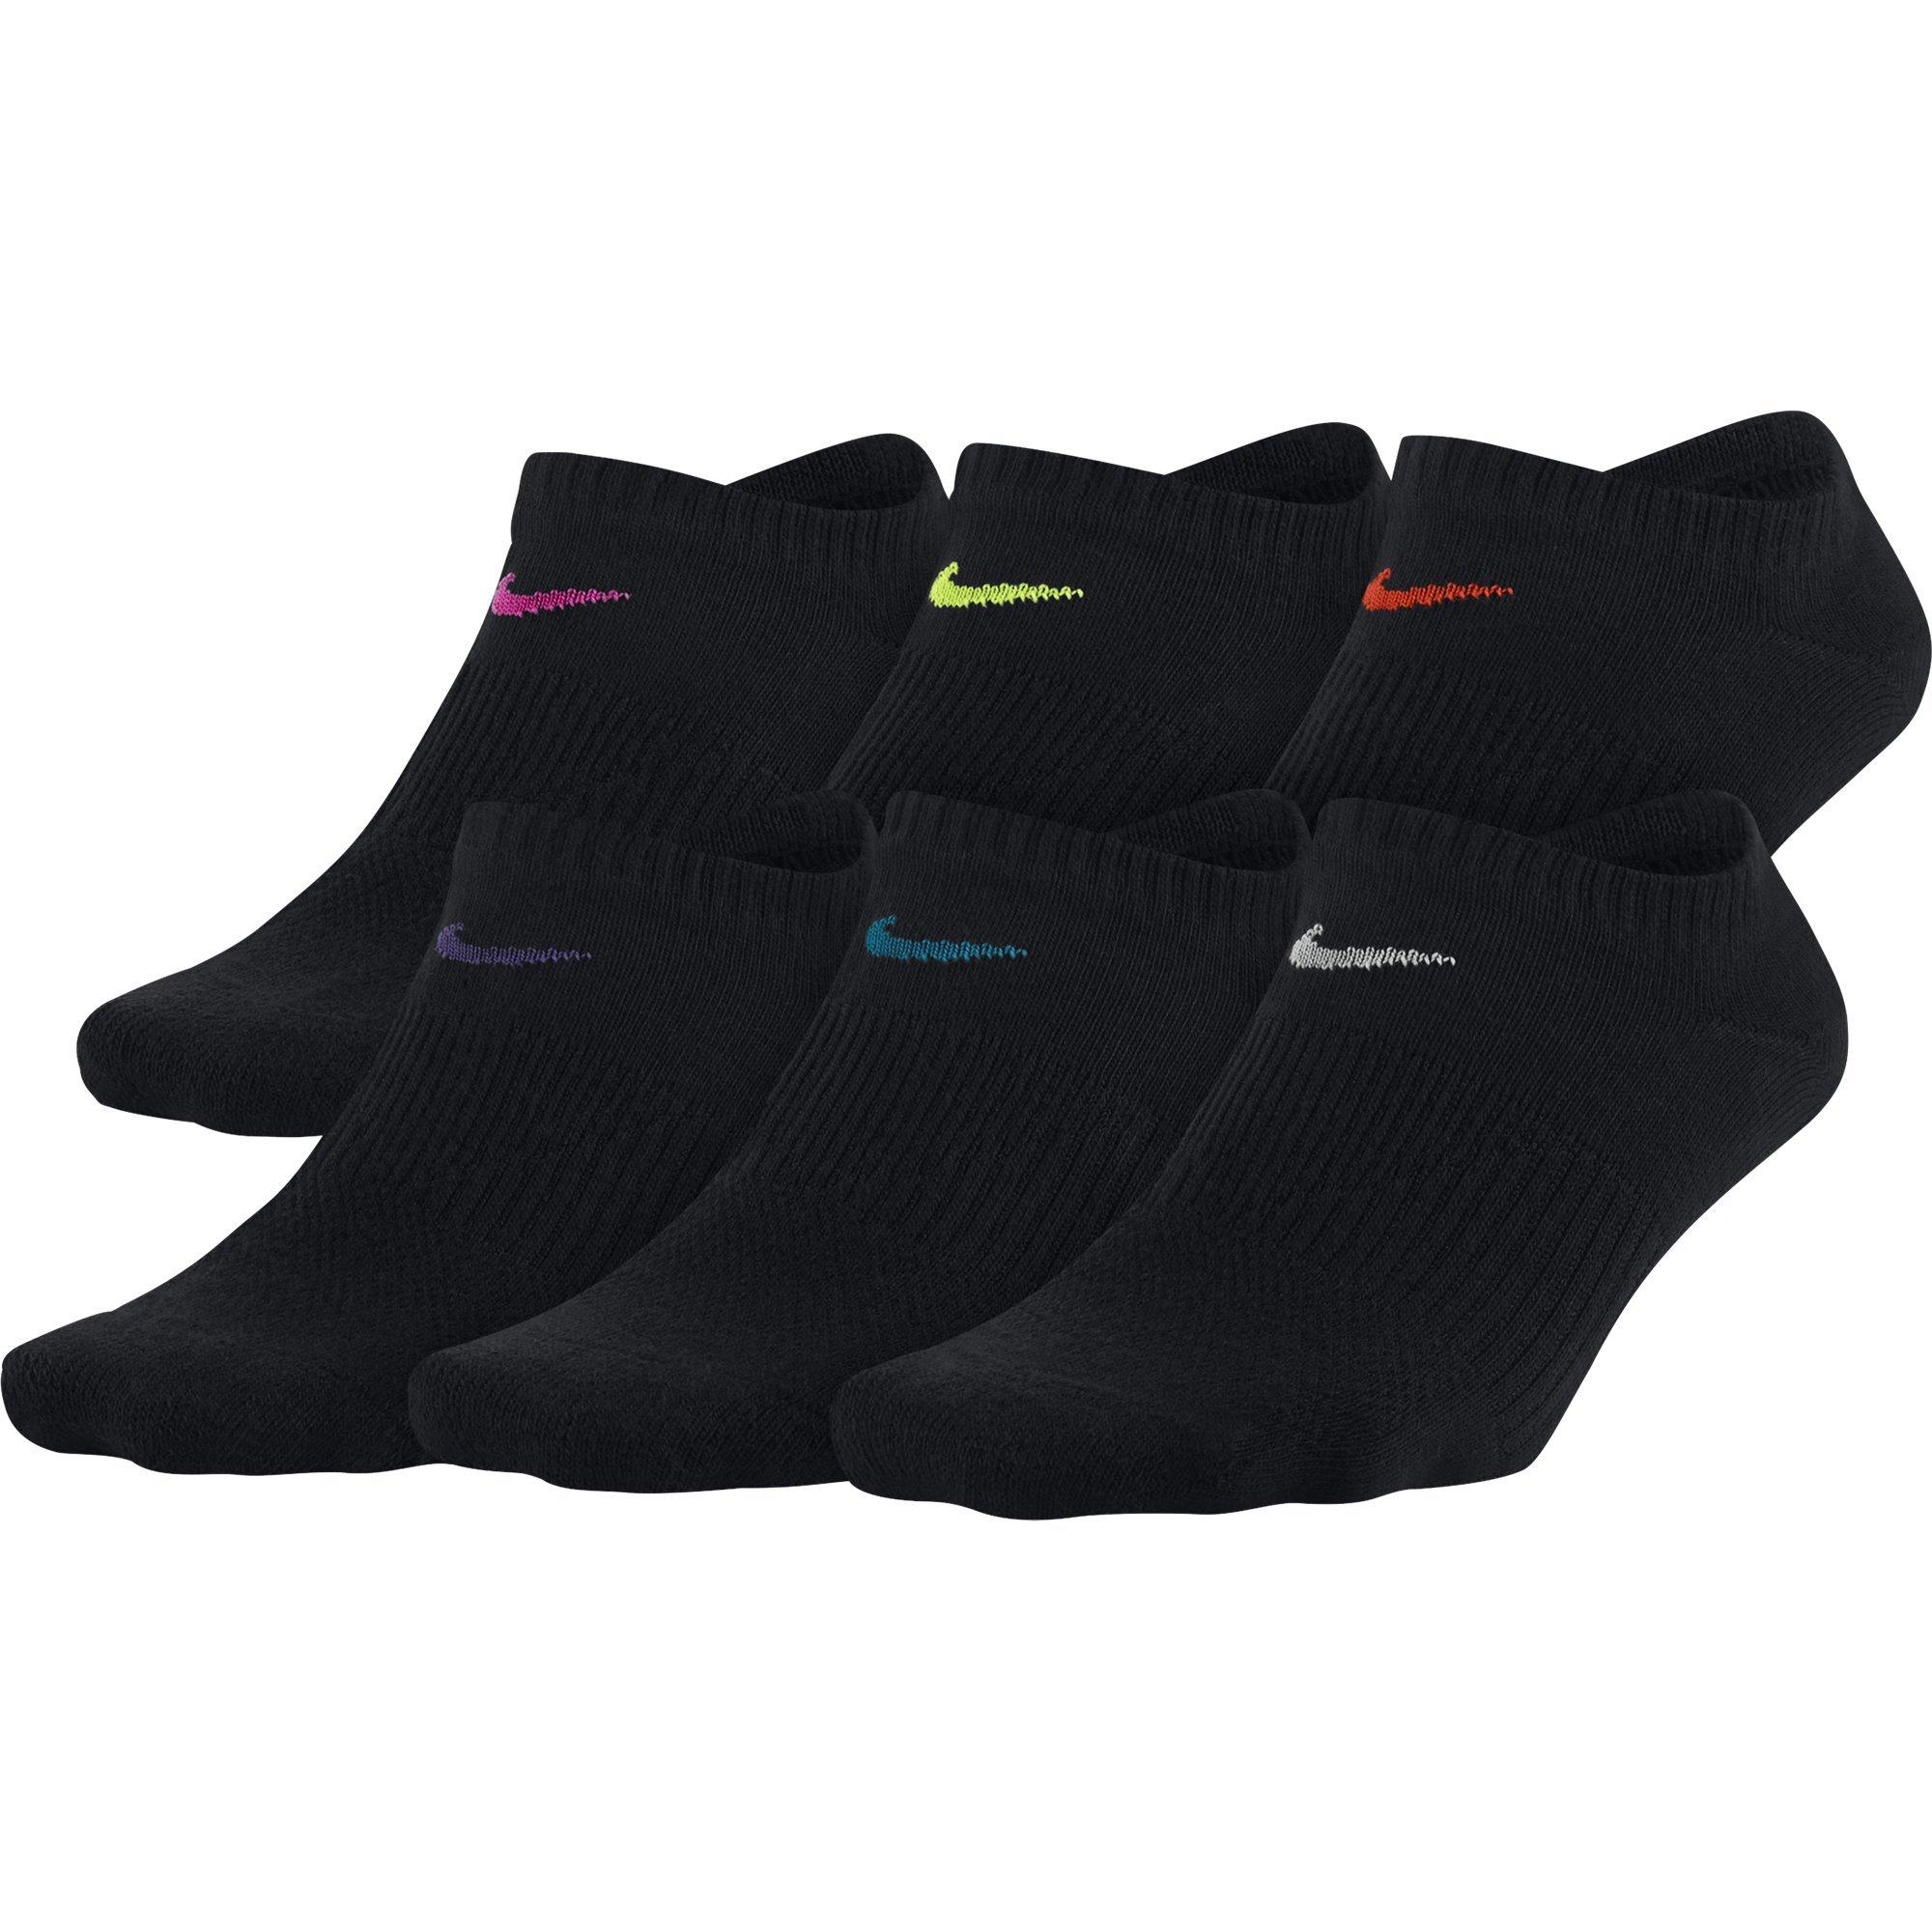 Nike Women's Everyday Lightweight No-Show Socks (6 Pair), Black/Multicolor, Small